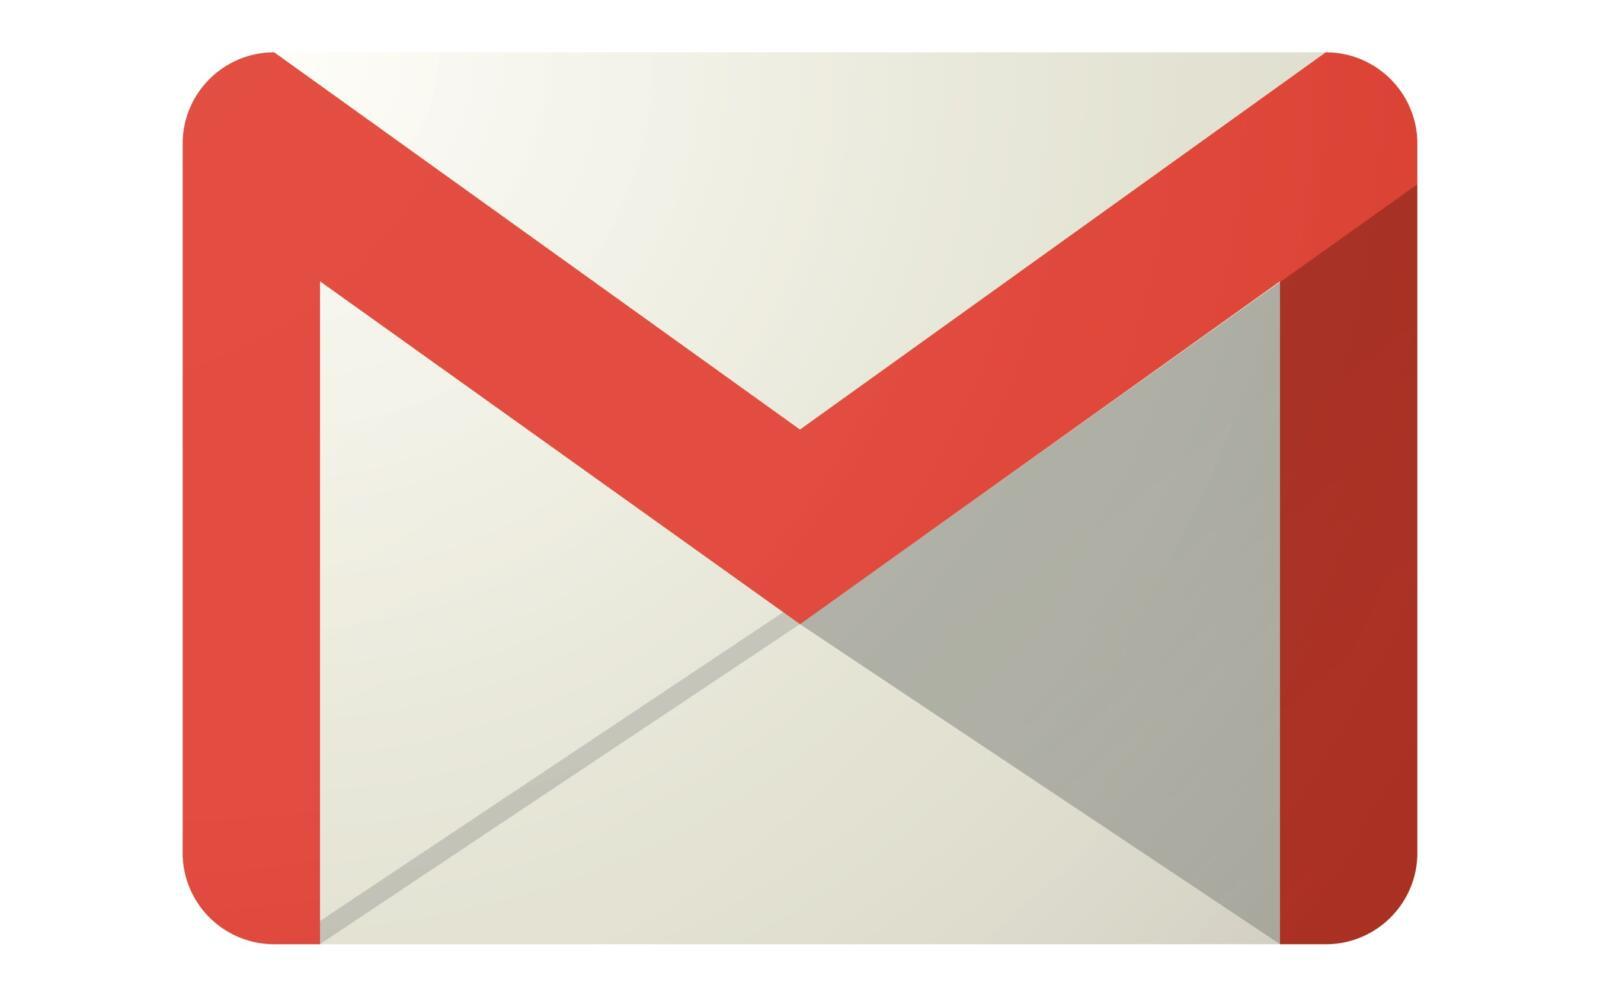 Gmail Google https